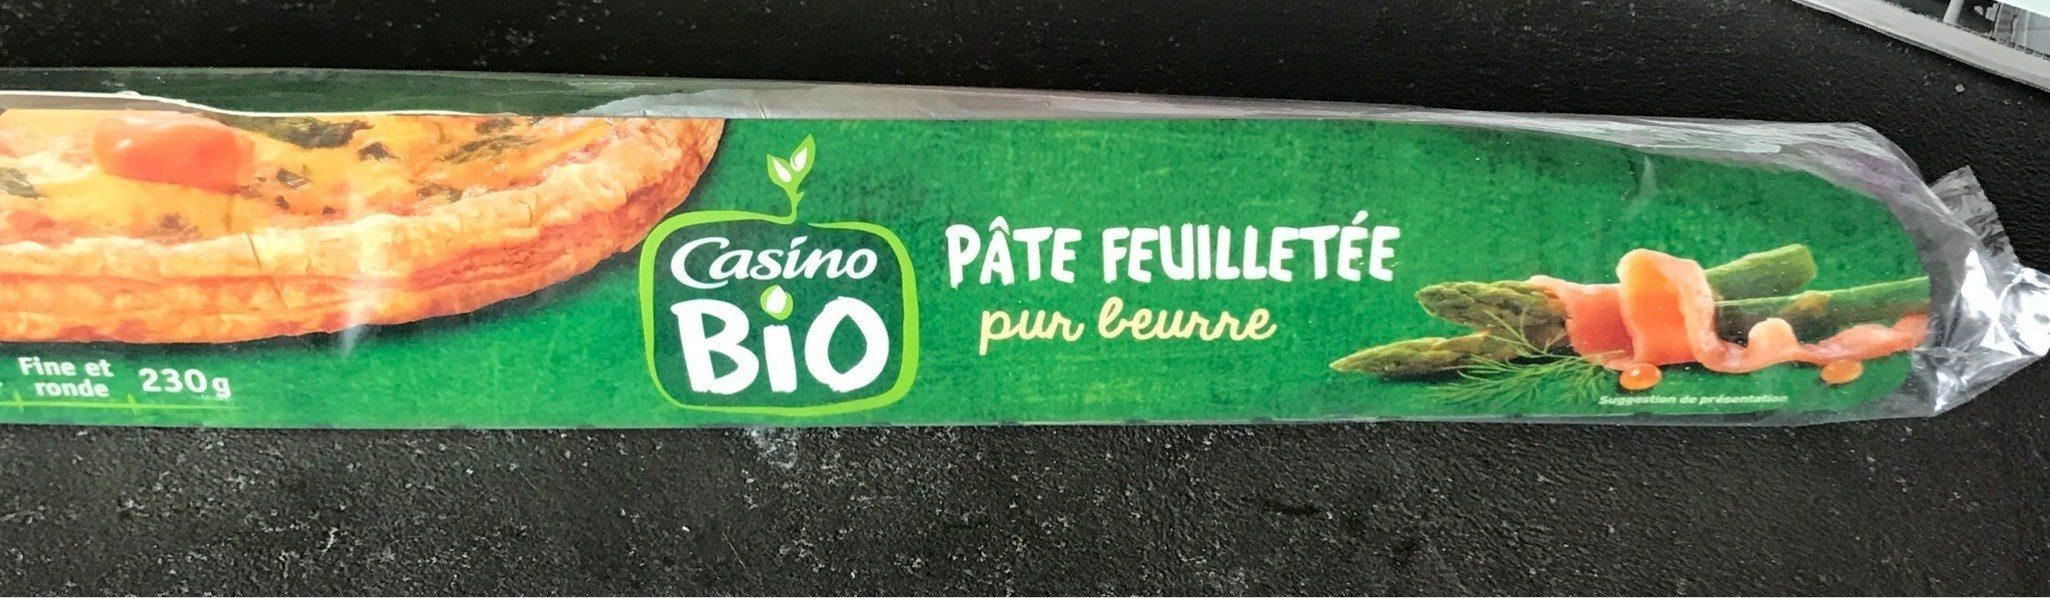 Pâte feuilletée pur beurre Bio - Product